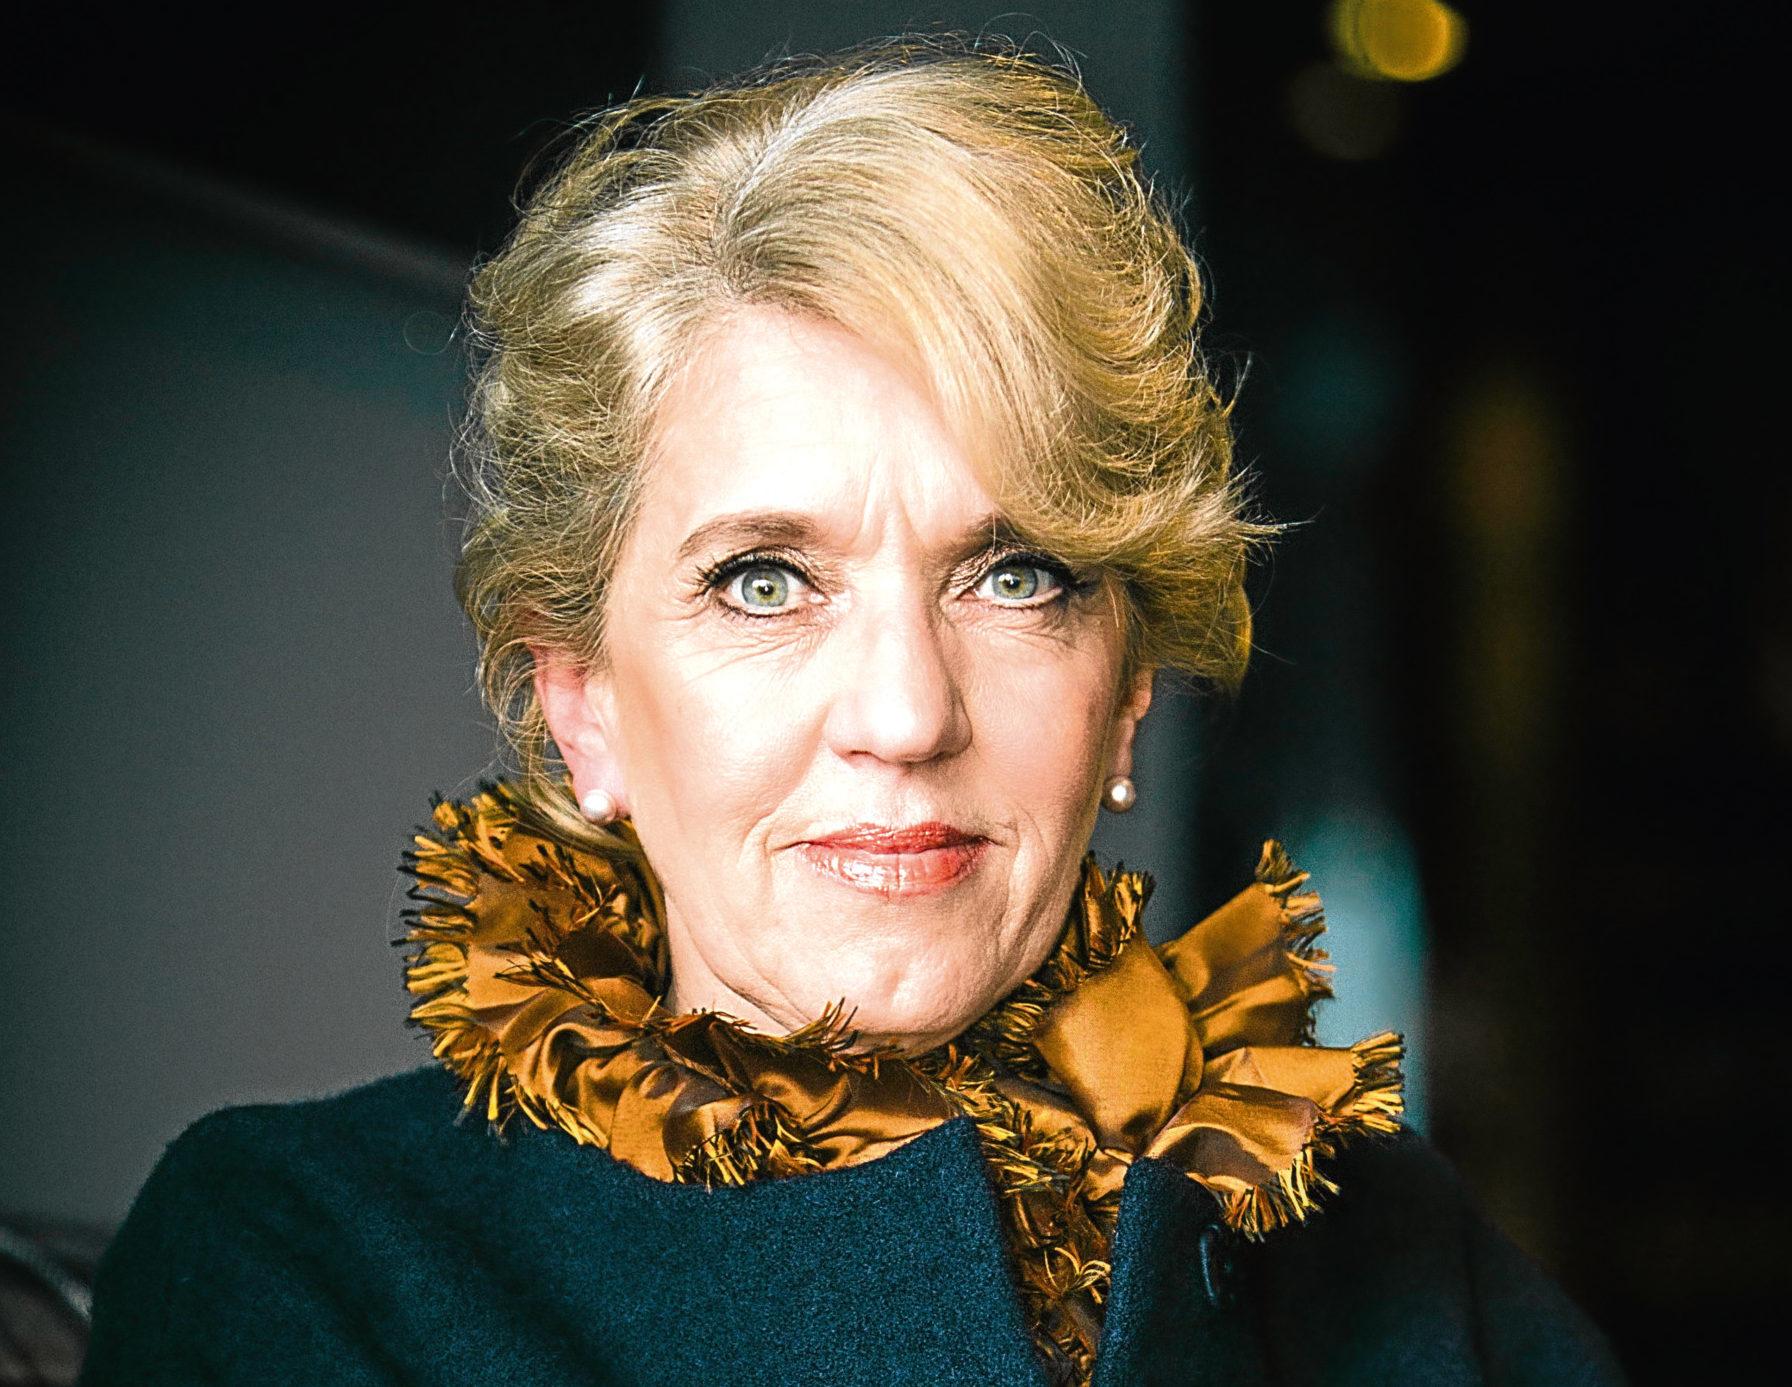 Jeanette Forbes, the proprietor of Grape and Grain